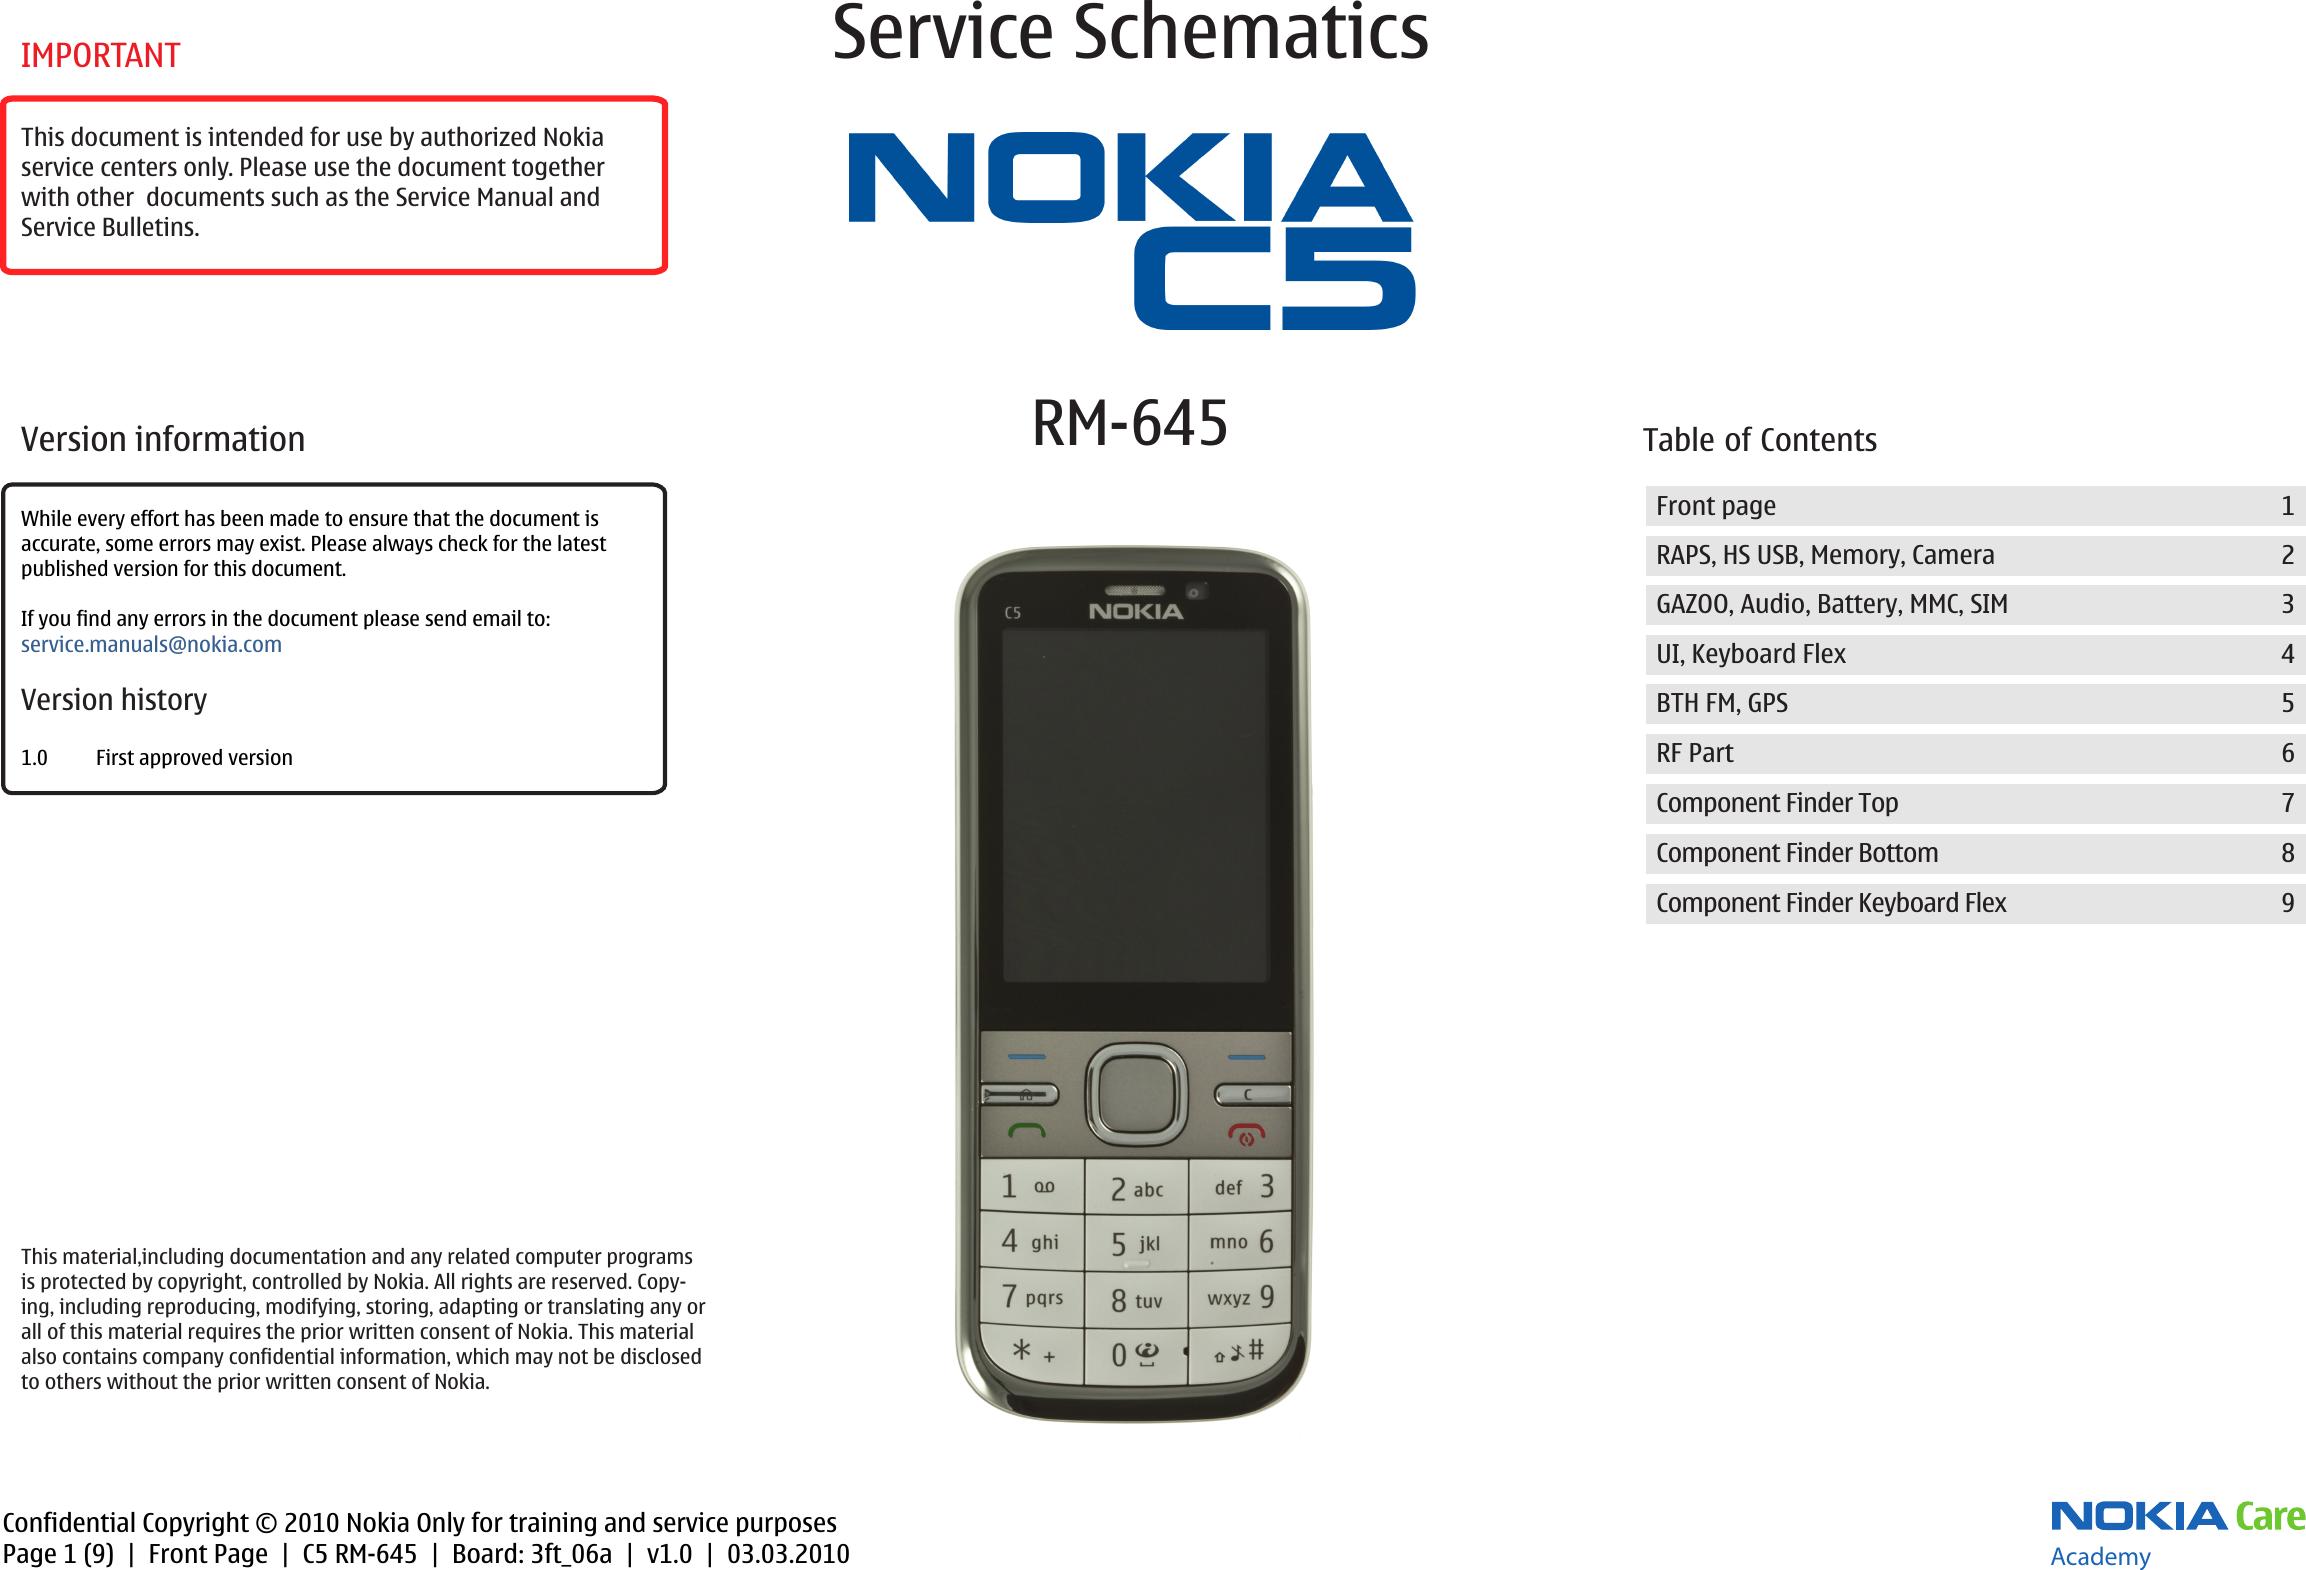 NOKIA C5-00 USER GUIDE PDF DOWNLOAD